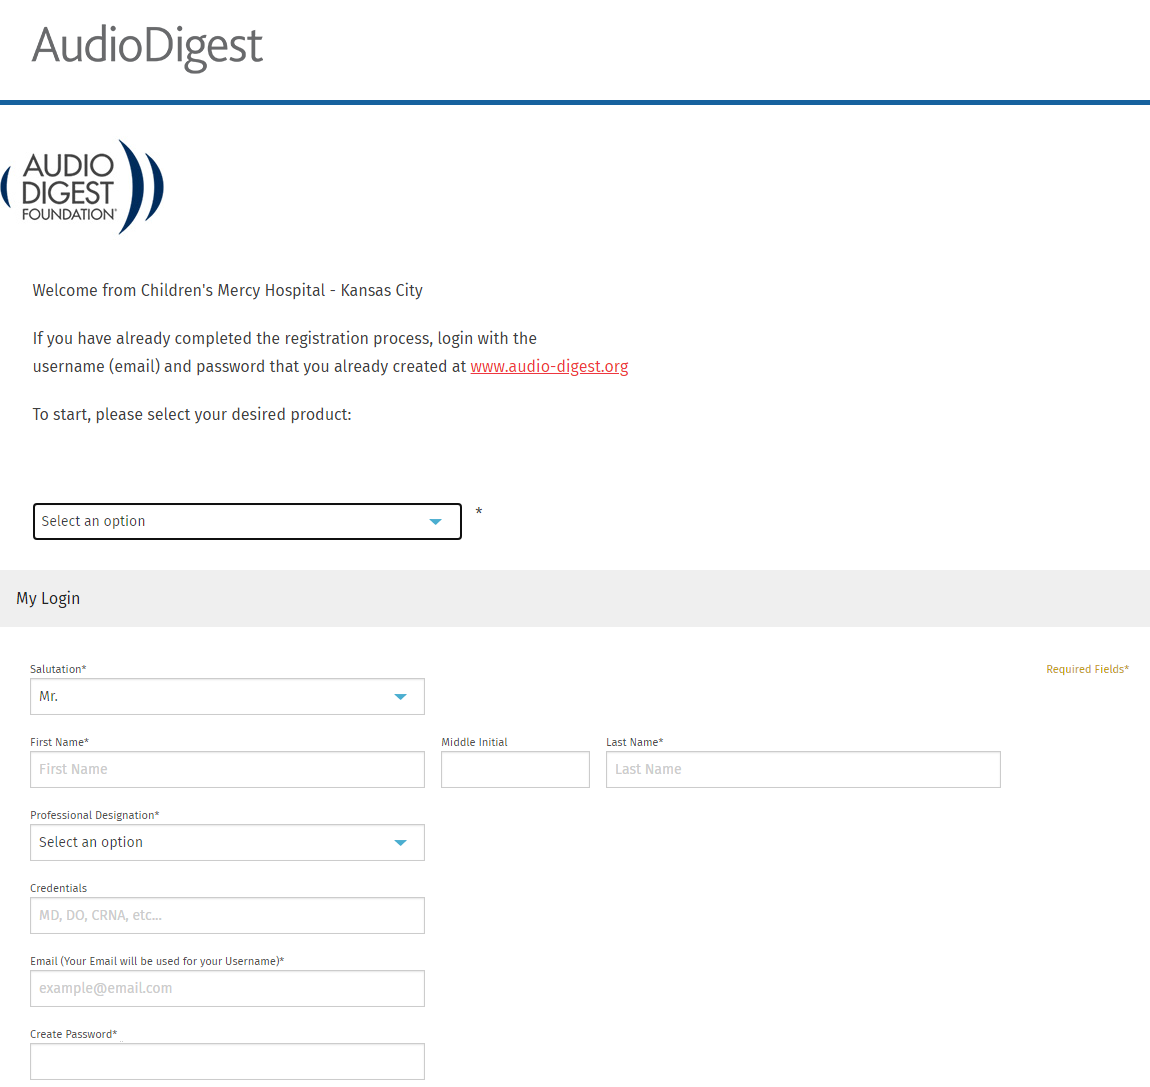 Audio Digest registration screen